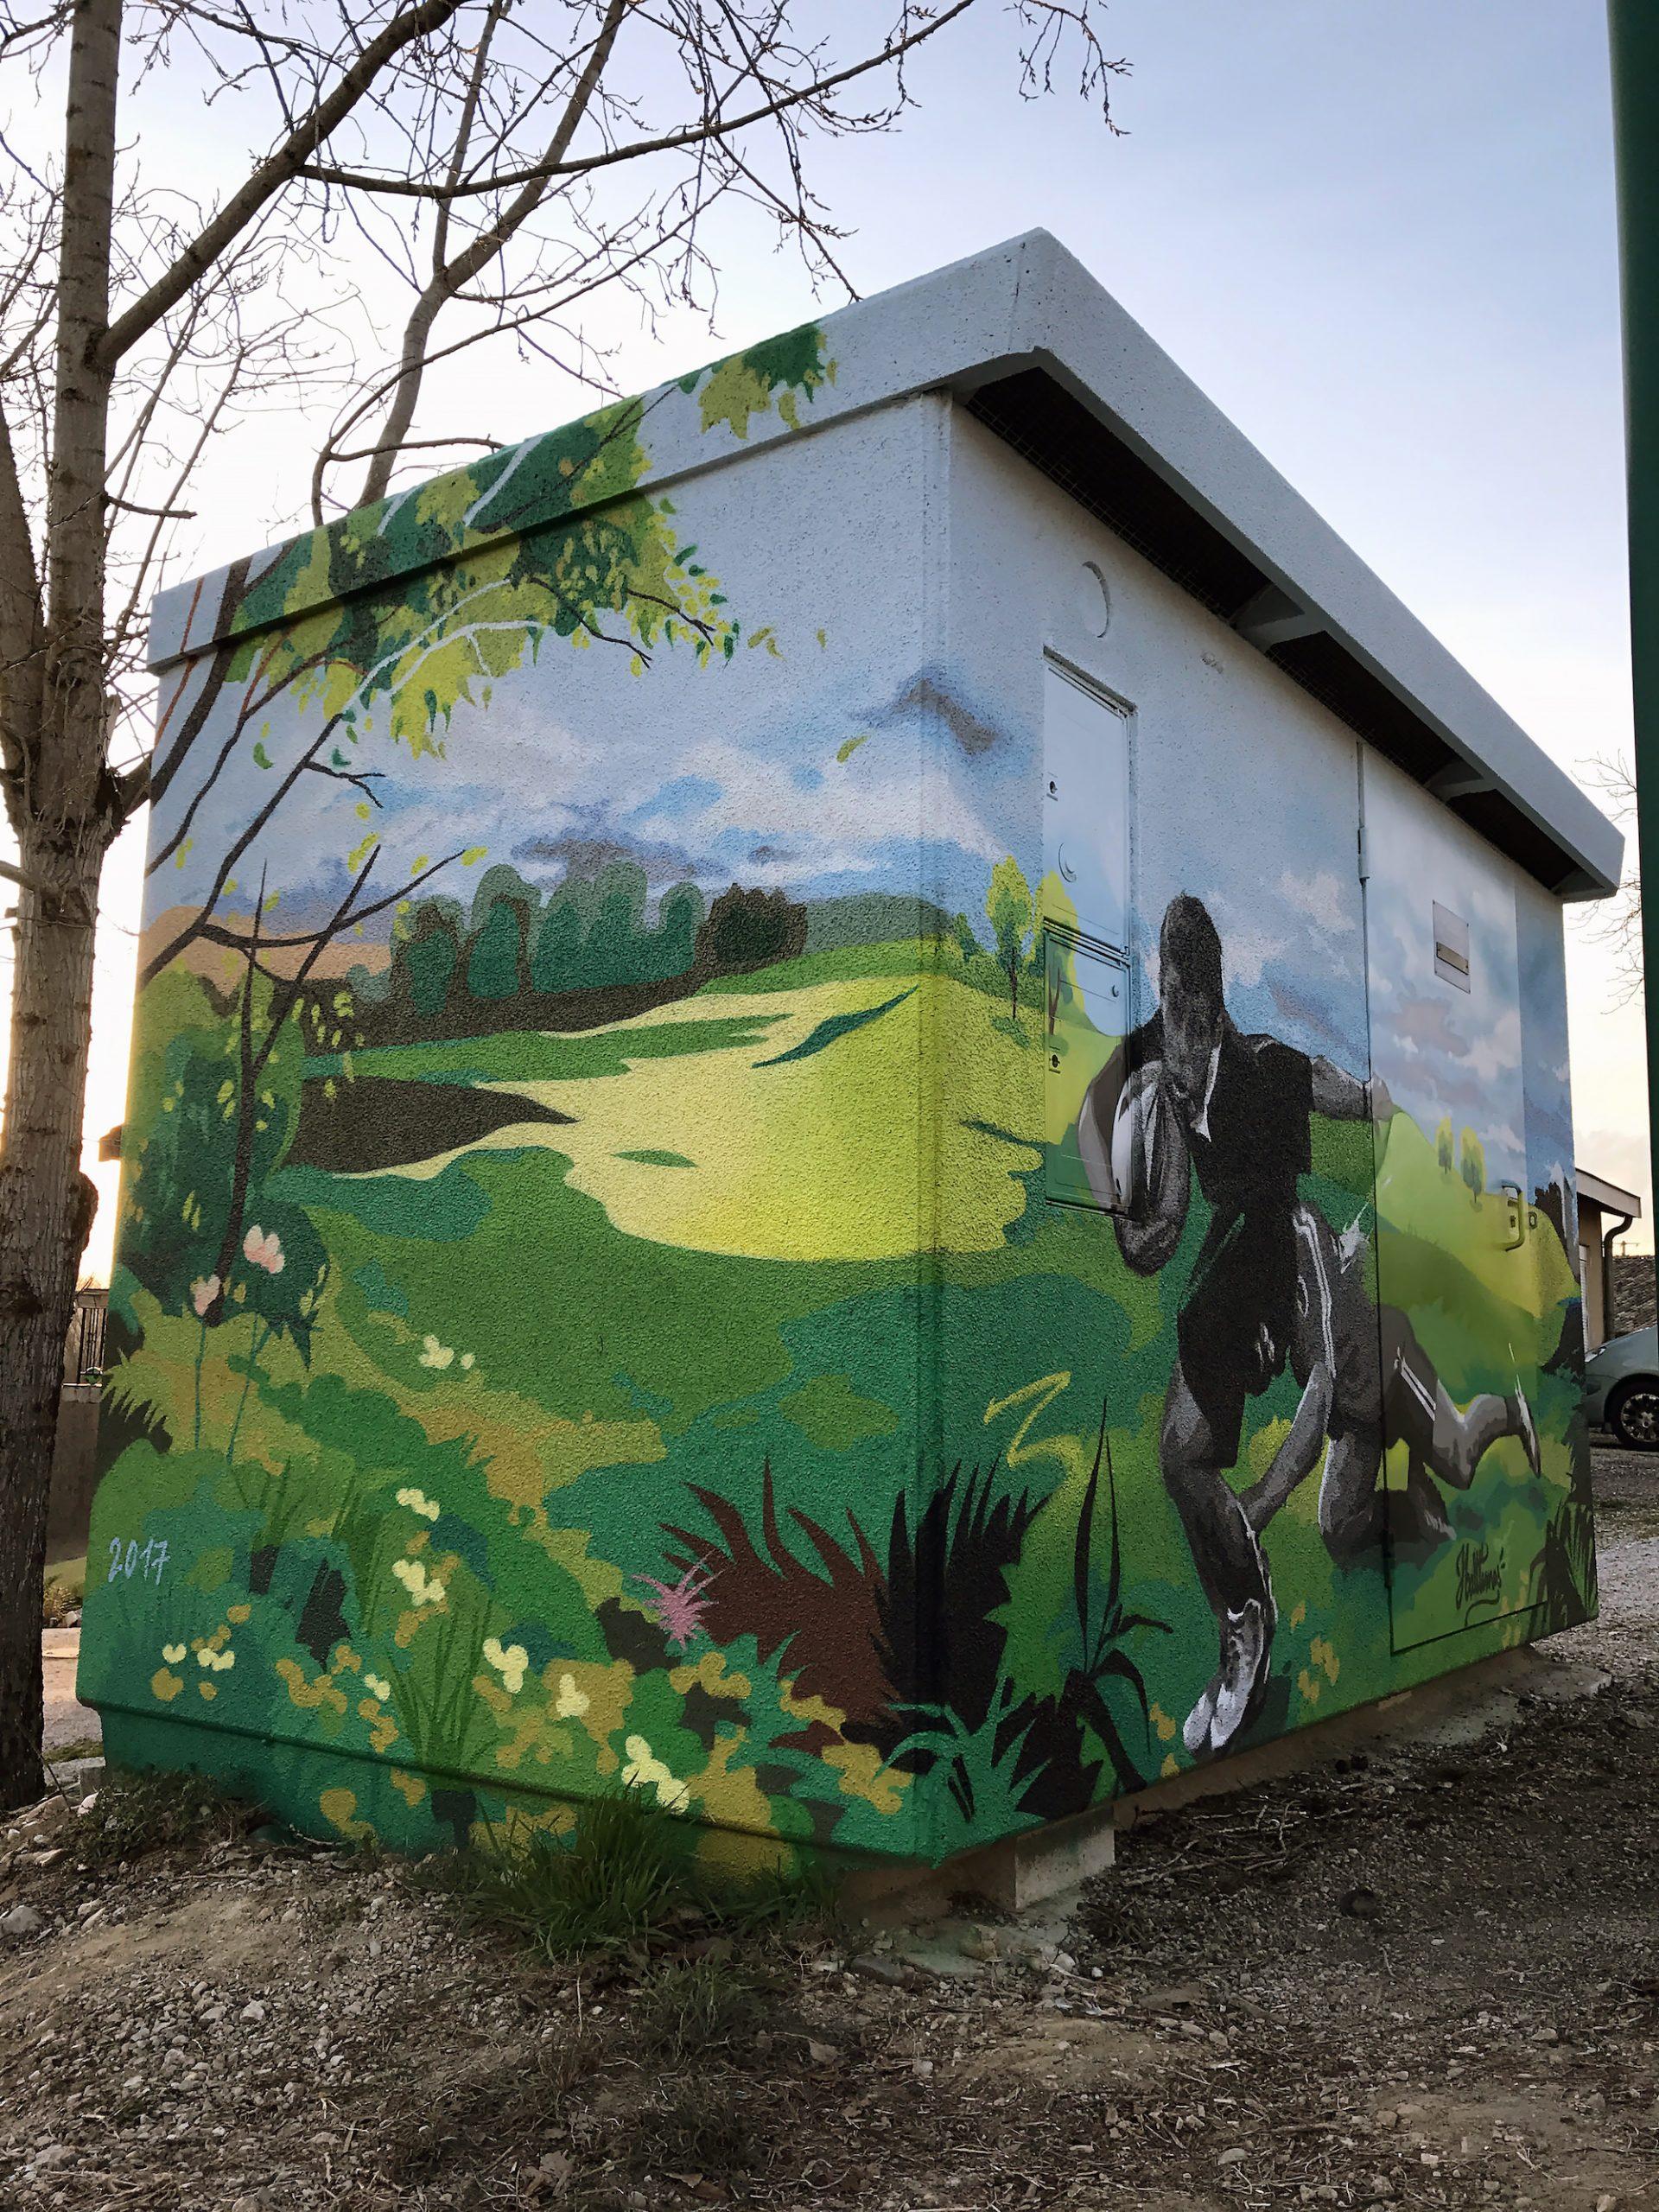 saintsardos-graffiti-transformateur-poste-transformation-fresque-graffiti-halltimes